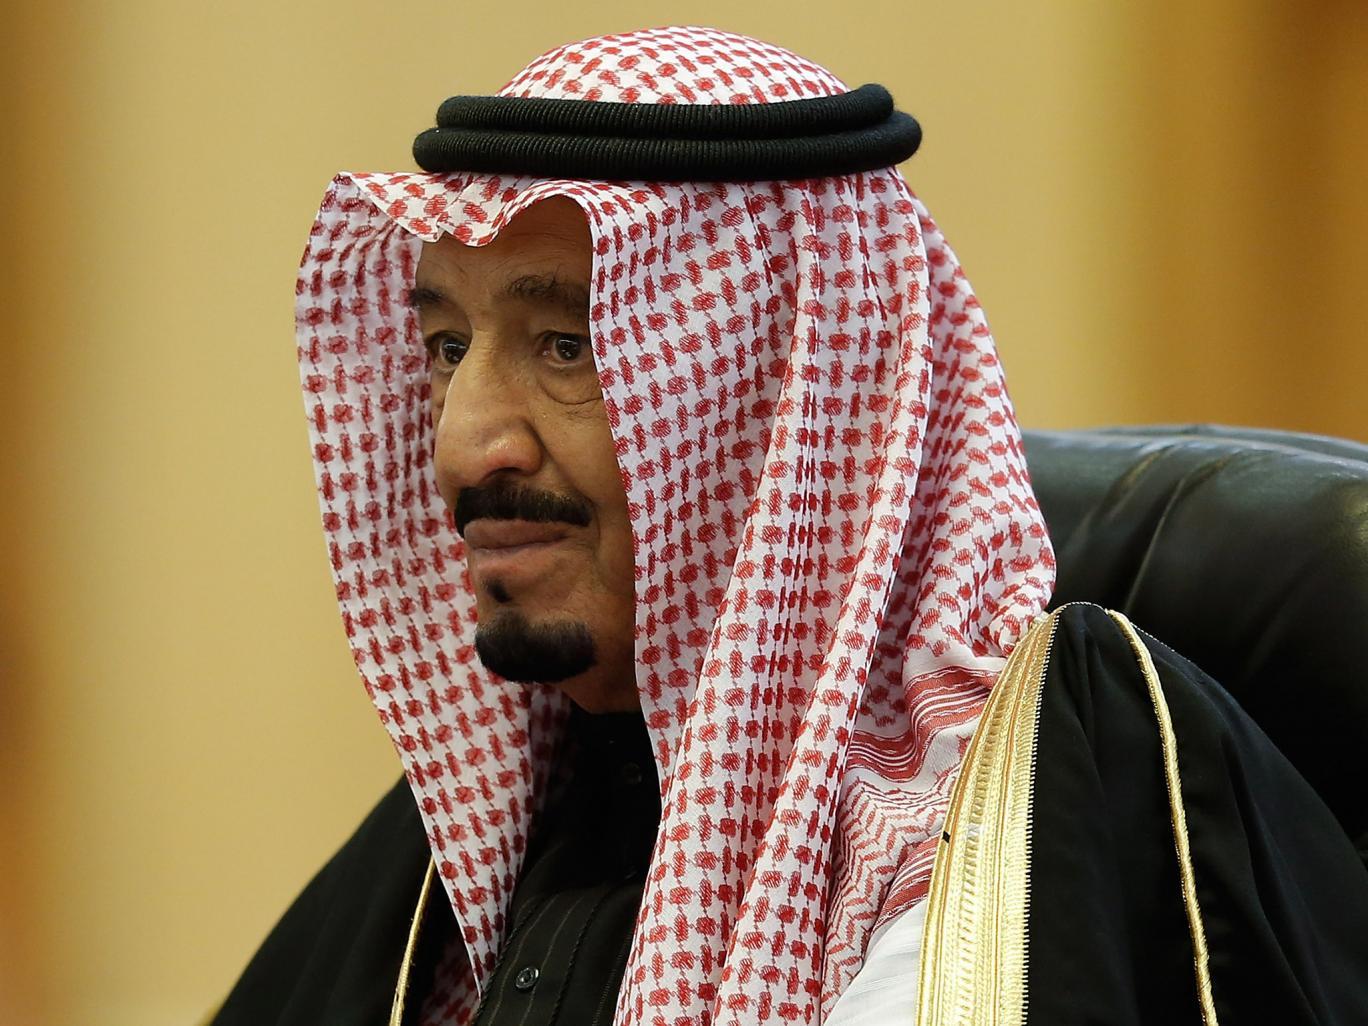 saudiarabiarefusestoevenconsiderallowingwomentodrive